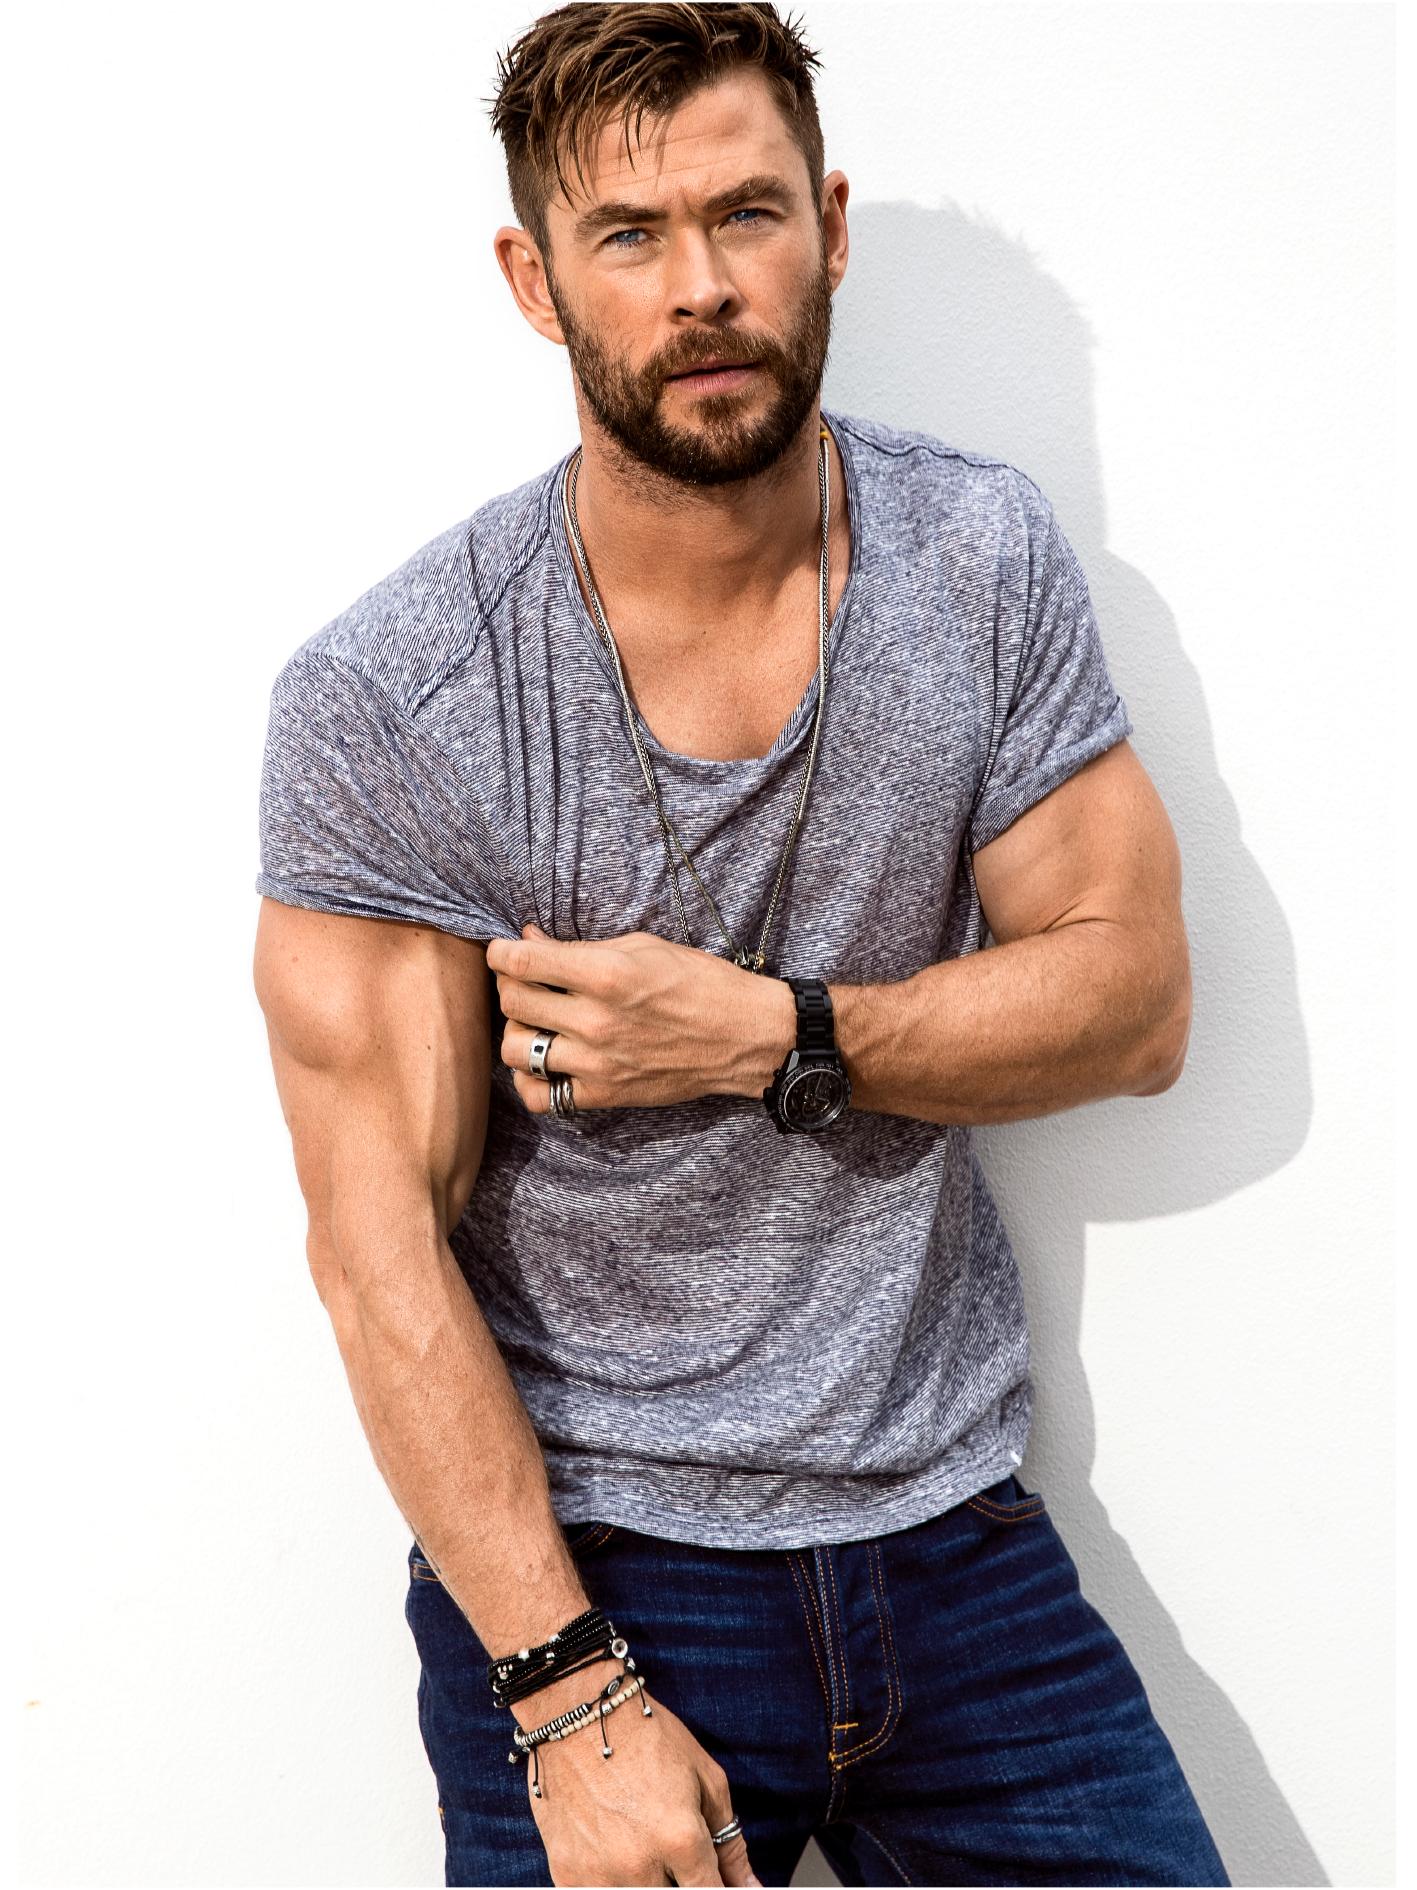 Chris Hemsworth Mens Health 2019 Jeans Png Chris Hemsworth Hemsworth Chris Hemsworth Thor